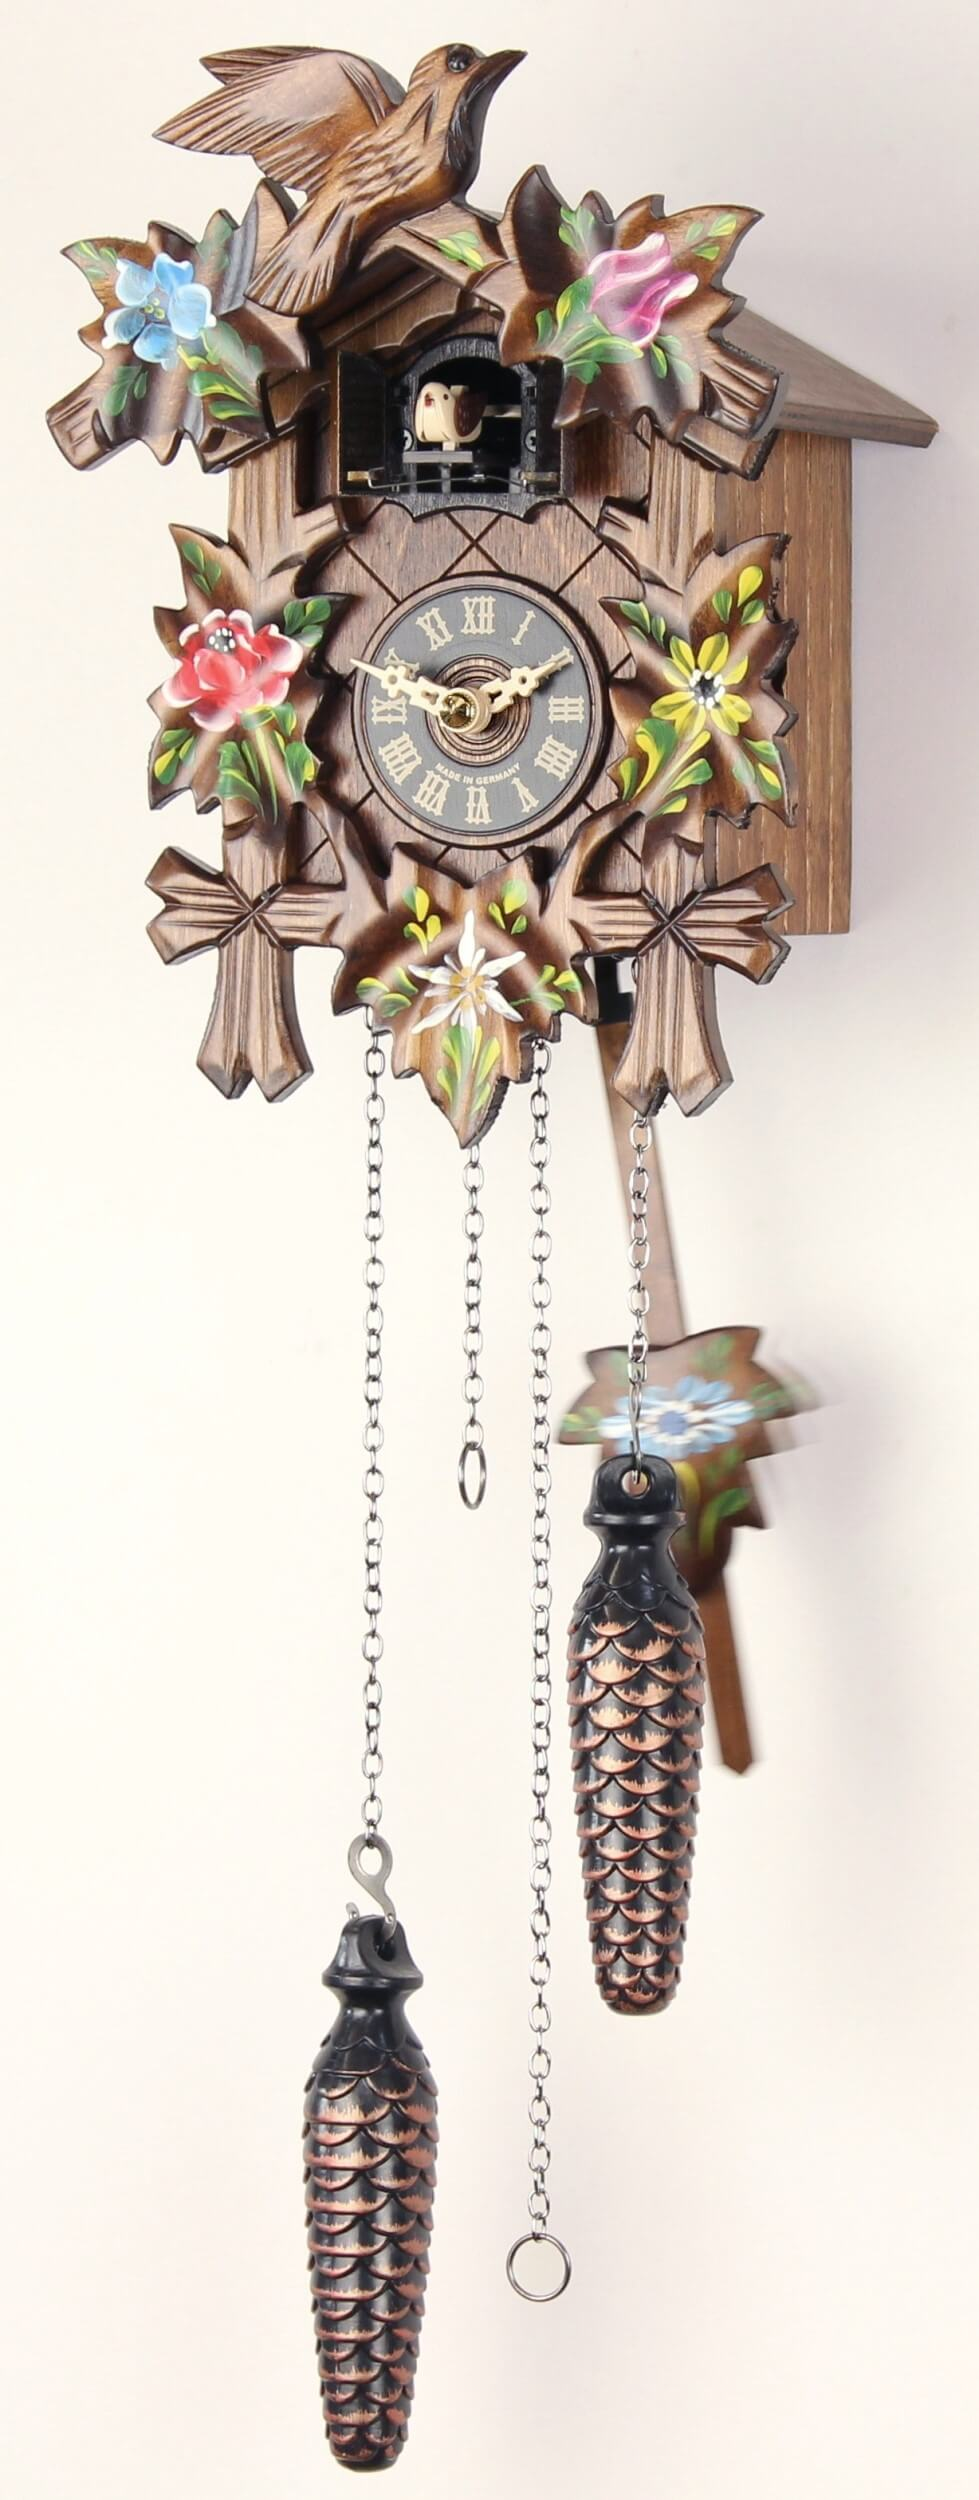 5 laub painted 25cm cuckoo clock cuckoo clock real wood new batte ebay - Cuckoo watches ...